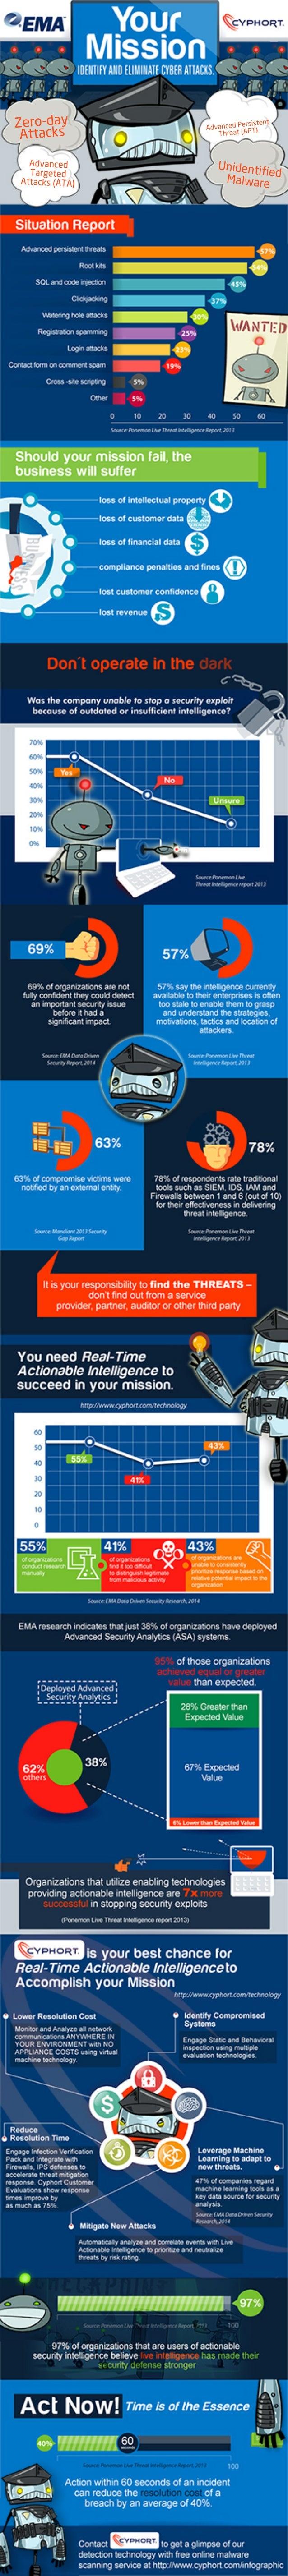 Zero-day Attacks Advanced Targeted Attacks(ATA) AdvancedPersistent Threat(APT) Unidentified Malware